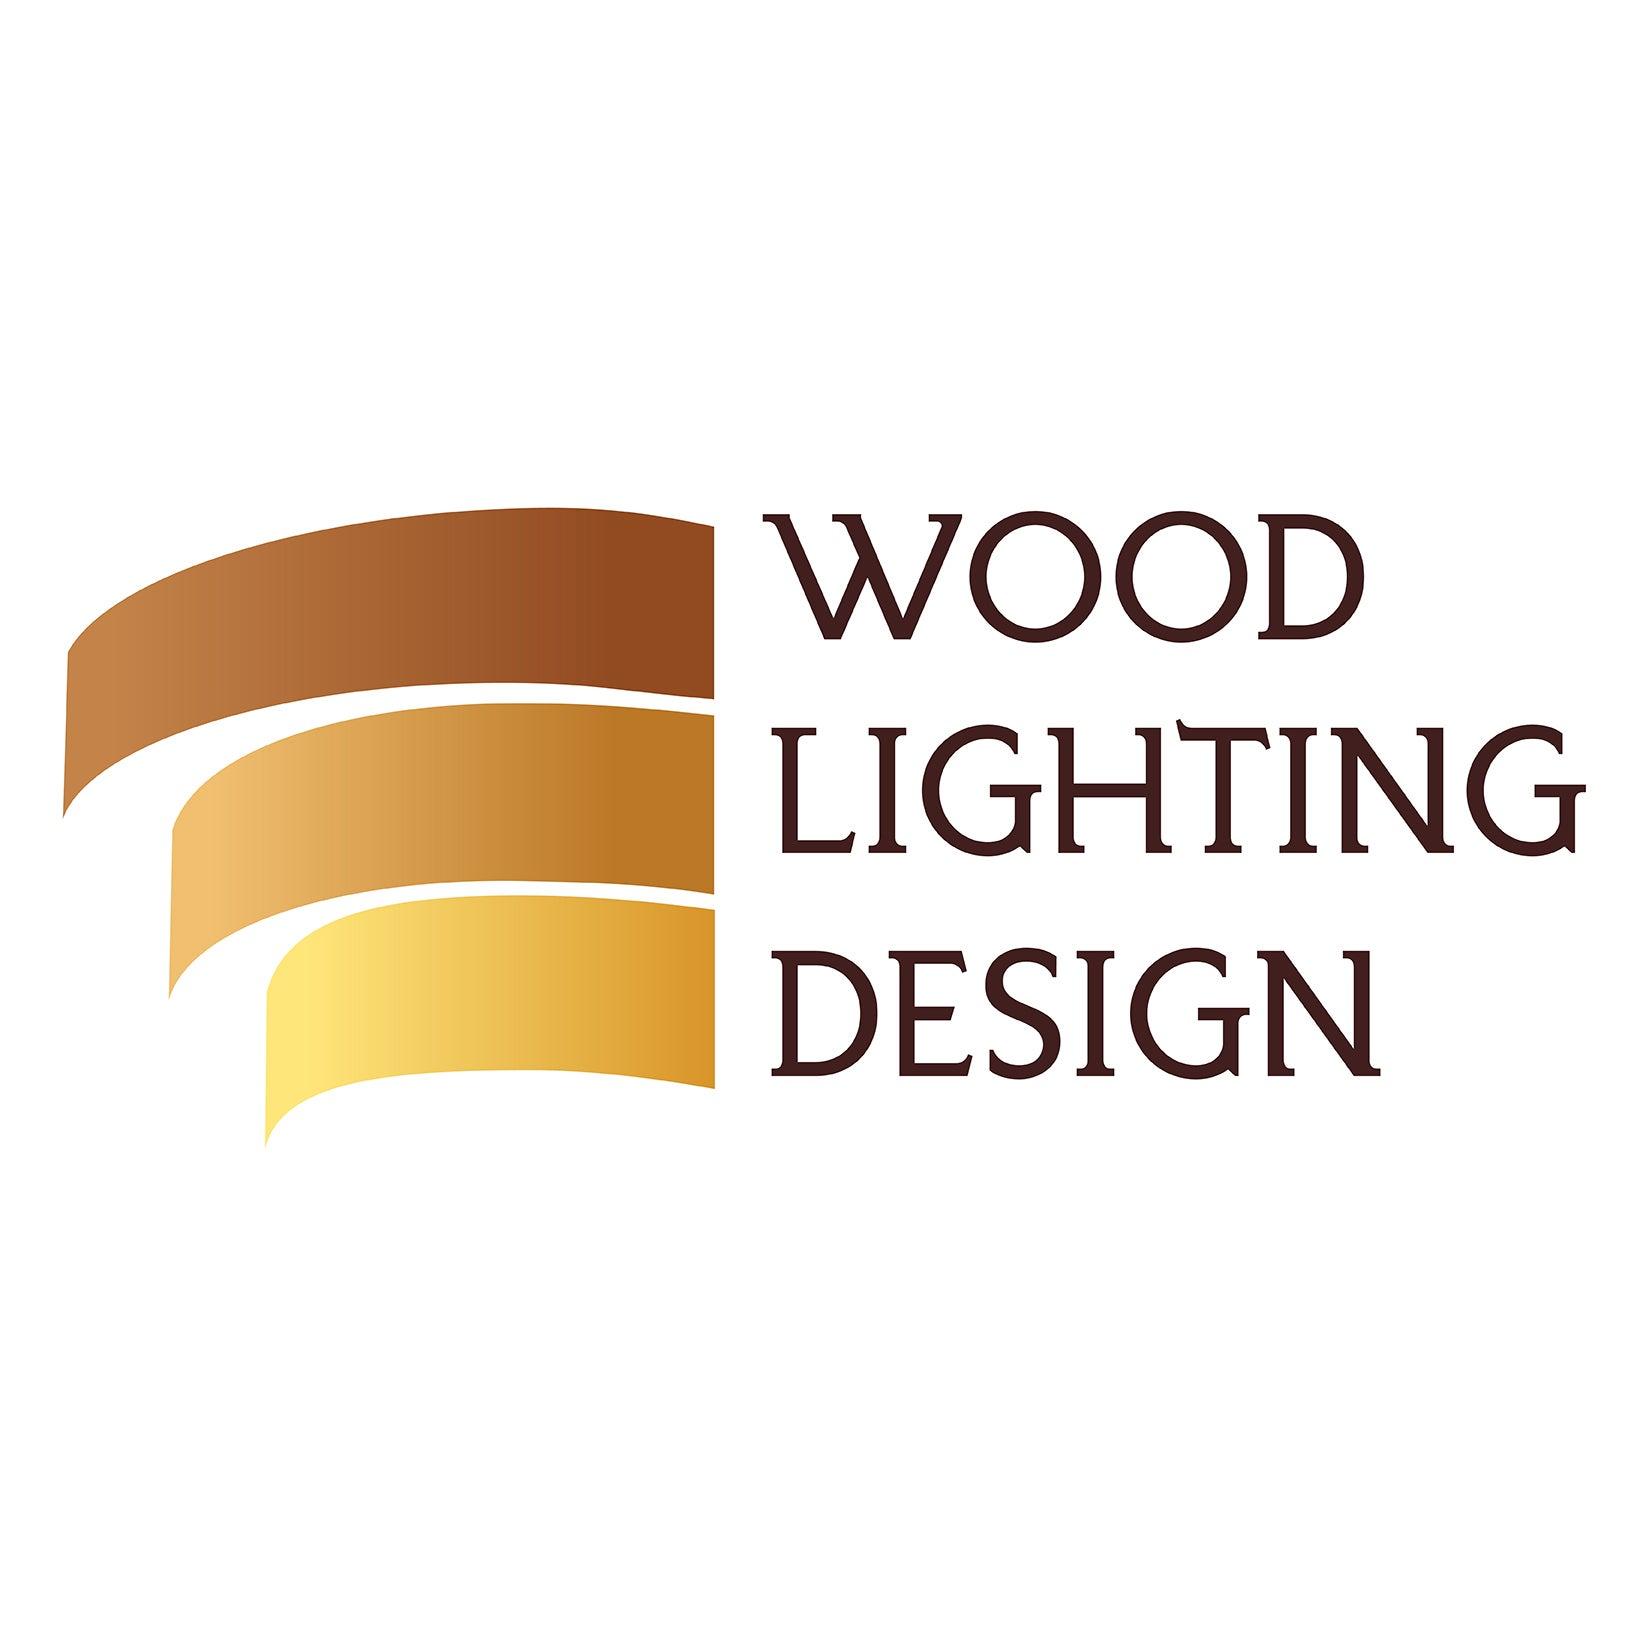 Wood Lighting Design